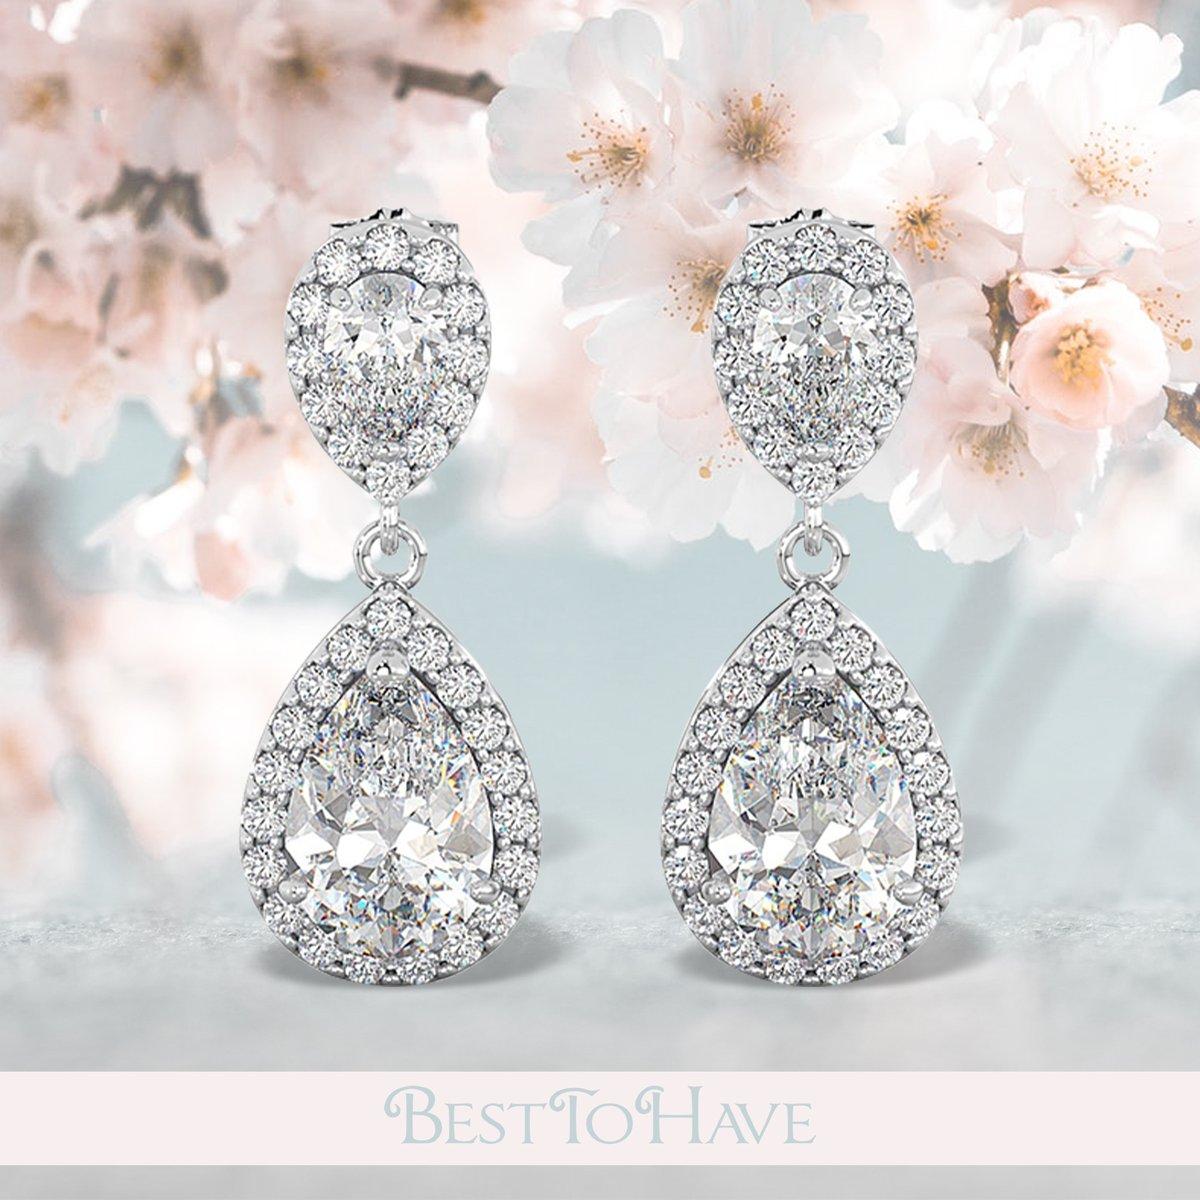 Sterling Silver Bridal Drop Earrings  Code: 220 £24.99  Shop more: https://www.besttohave.com/   #womenearrings #weddingearrings #lovejewelry #silverjewelry #sterlingsilver #cubiczirconia #fashion #glamorous #besttohave #besttohavejewelry #gift #present #silverearrings #zirconiapic.twitter.com/6qERCwkoqj